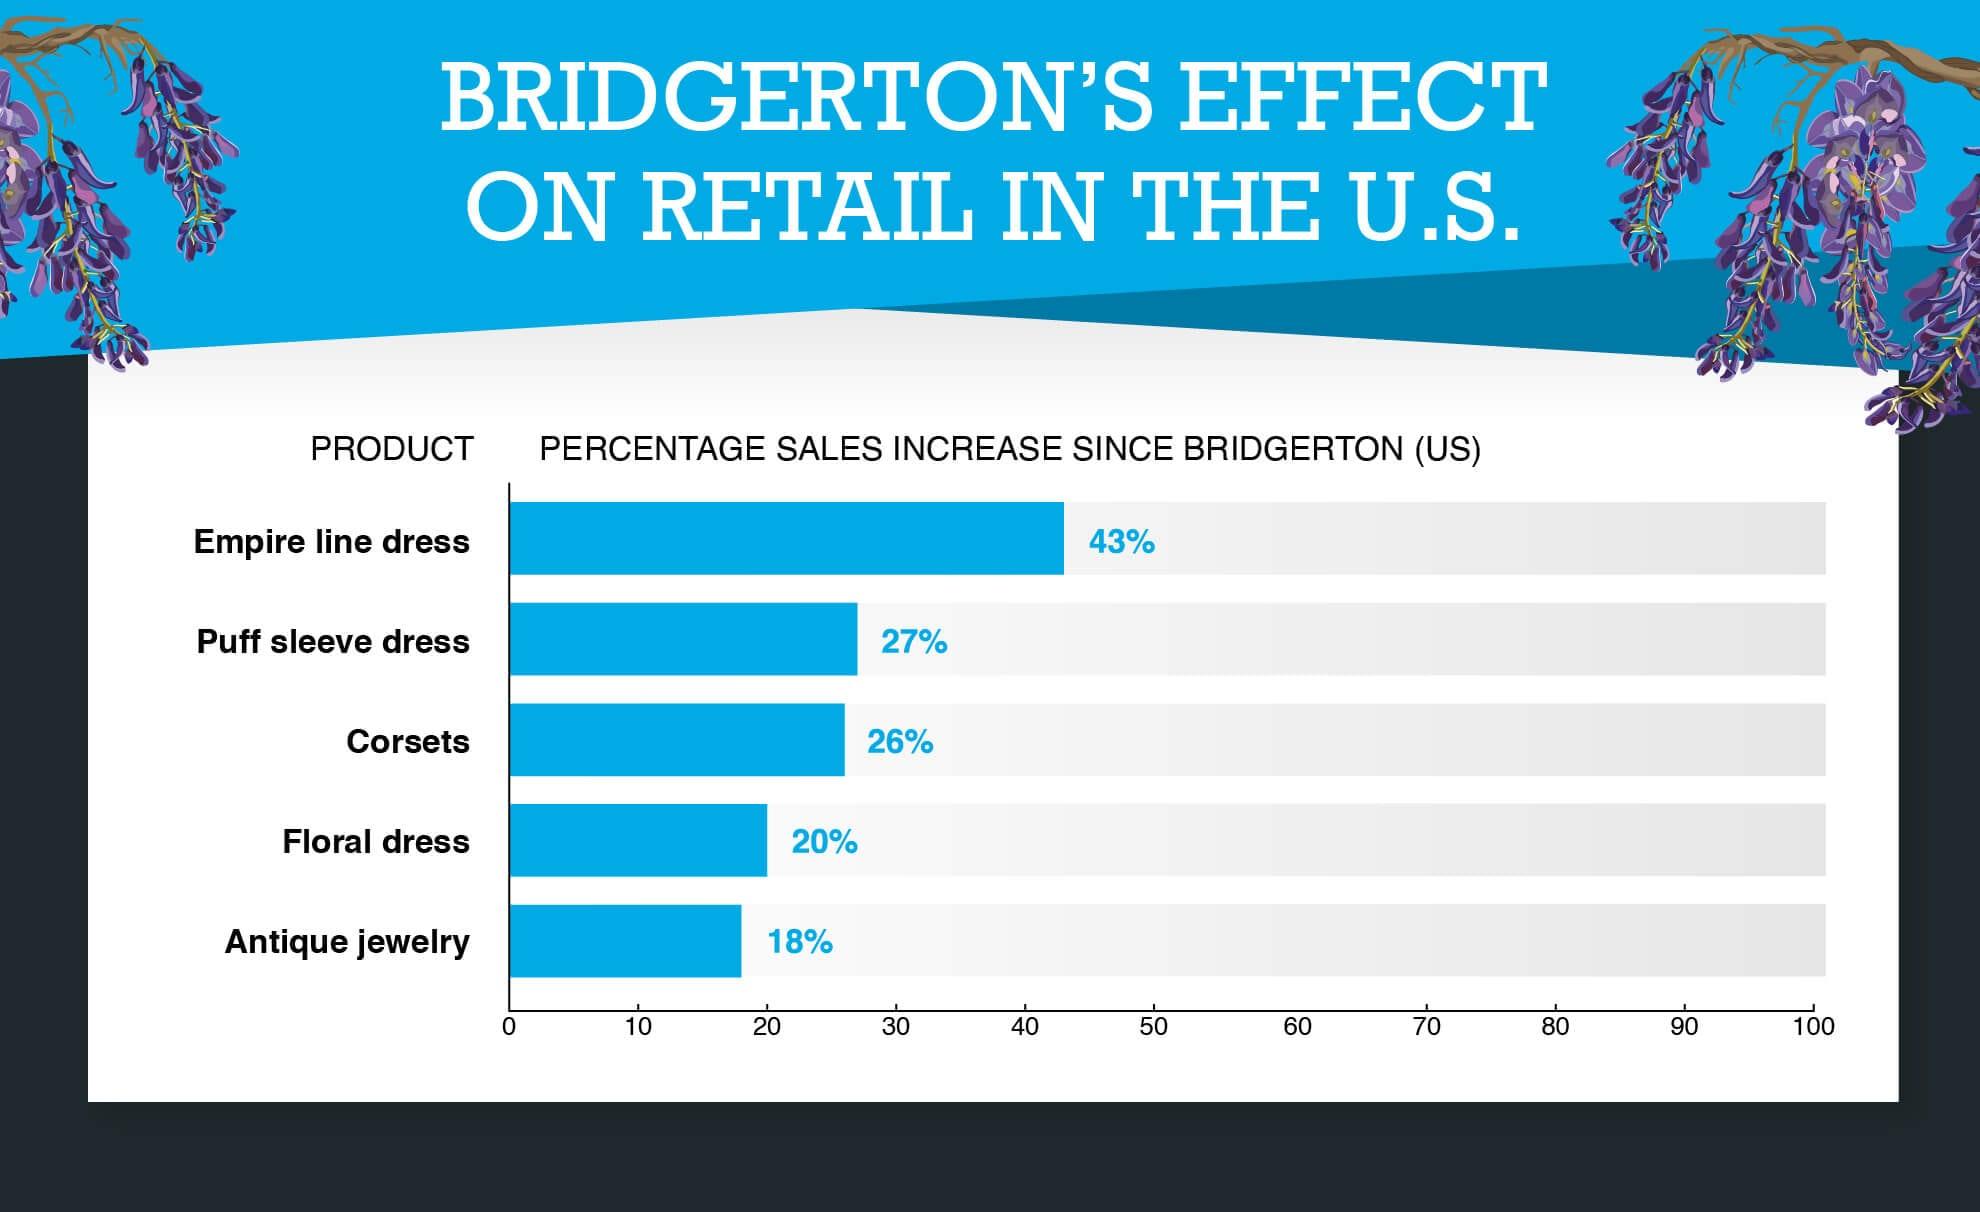 Bridgerton's Effect on Retail in the US